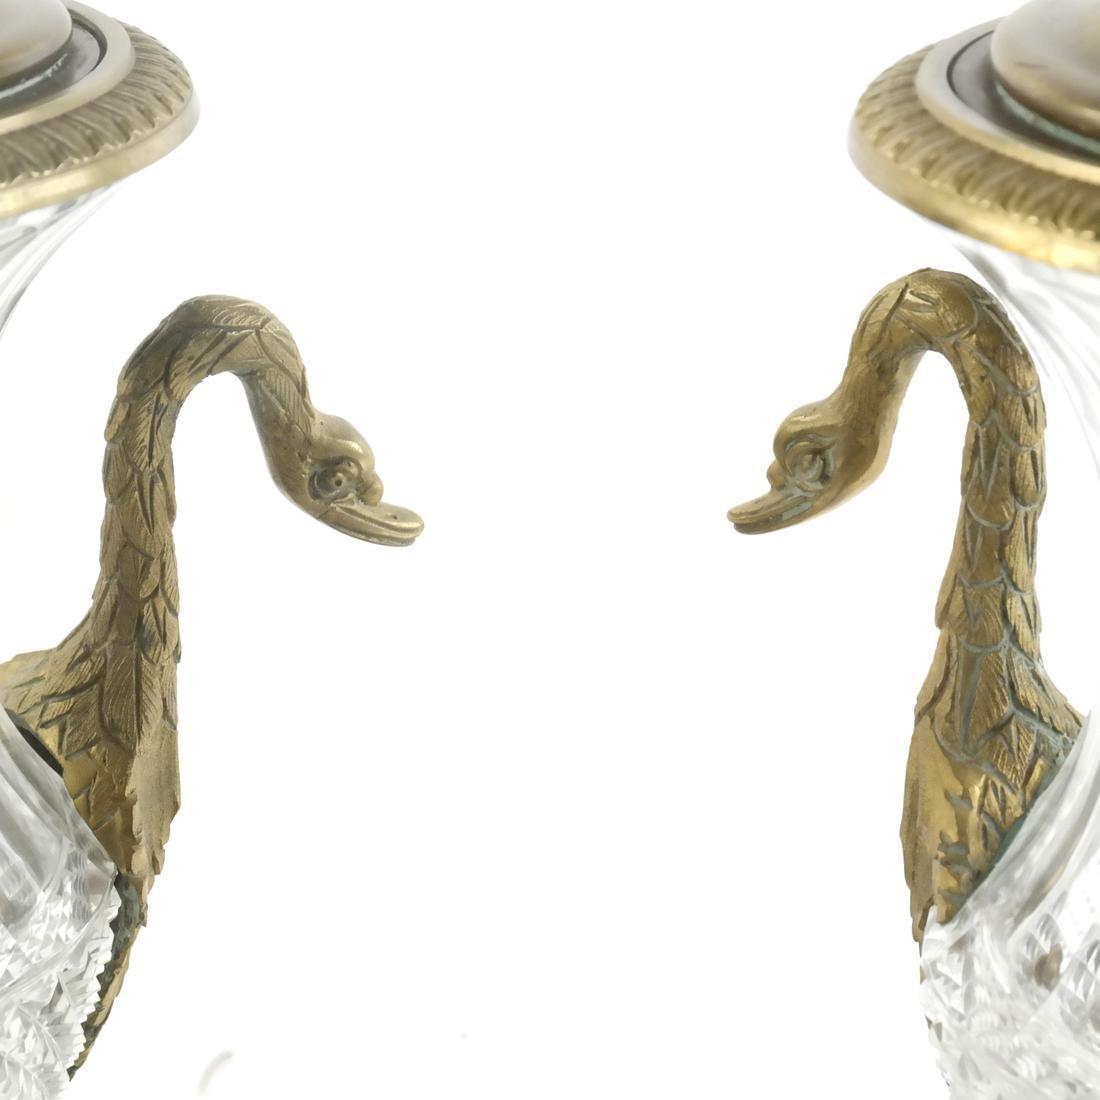 Pair of Classical Swan-Form Lamps - 2